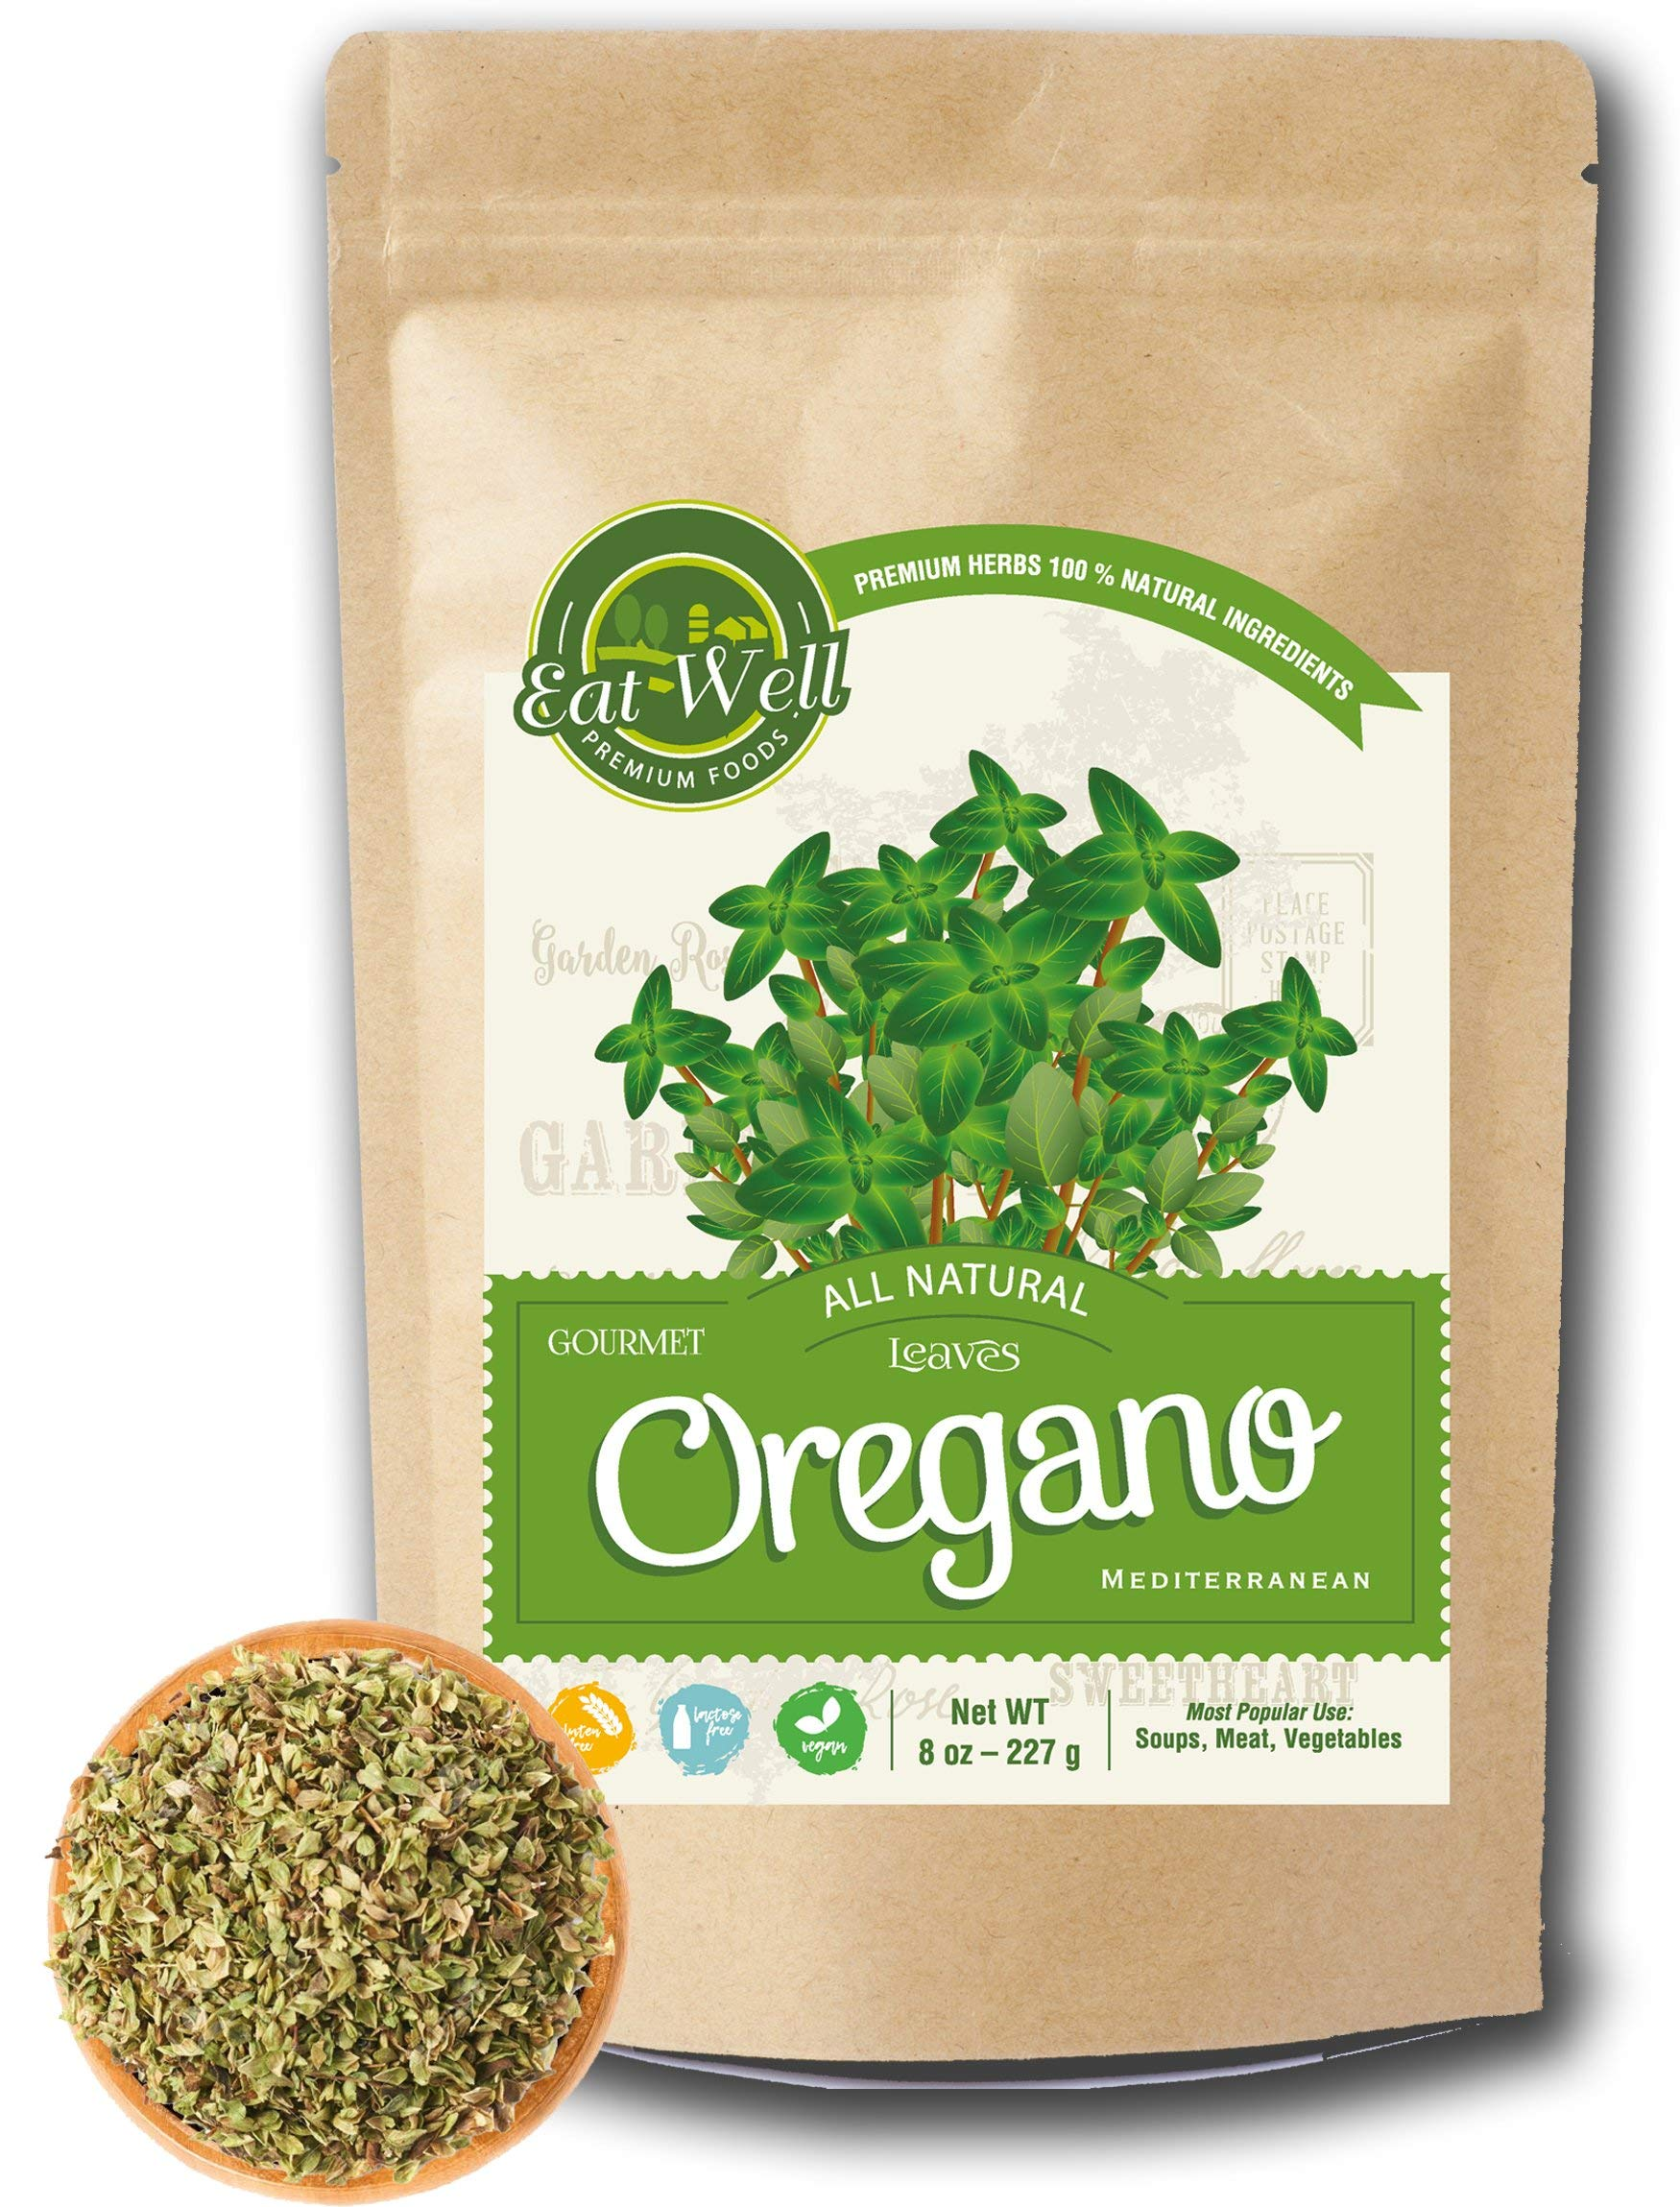 Oregano Leaves | 8 oz - 227 g Reseable Bag, Bulk | Mediterranean Natural Leaf |100% Natural Dried Oregano Leaves | Herbal Tea | Herbs & Spices | Eat Well Premium Foods